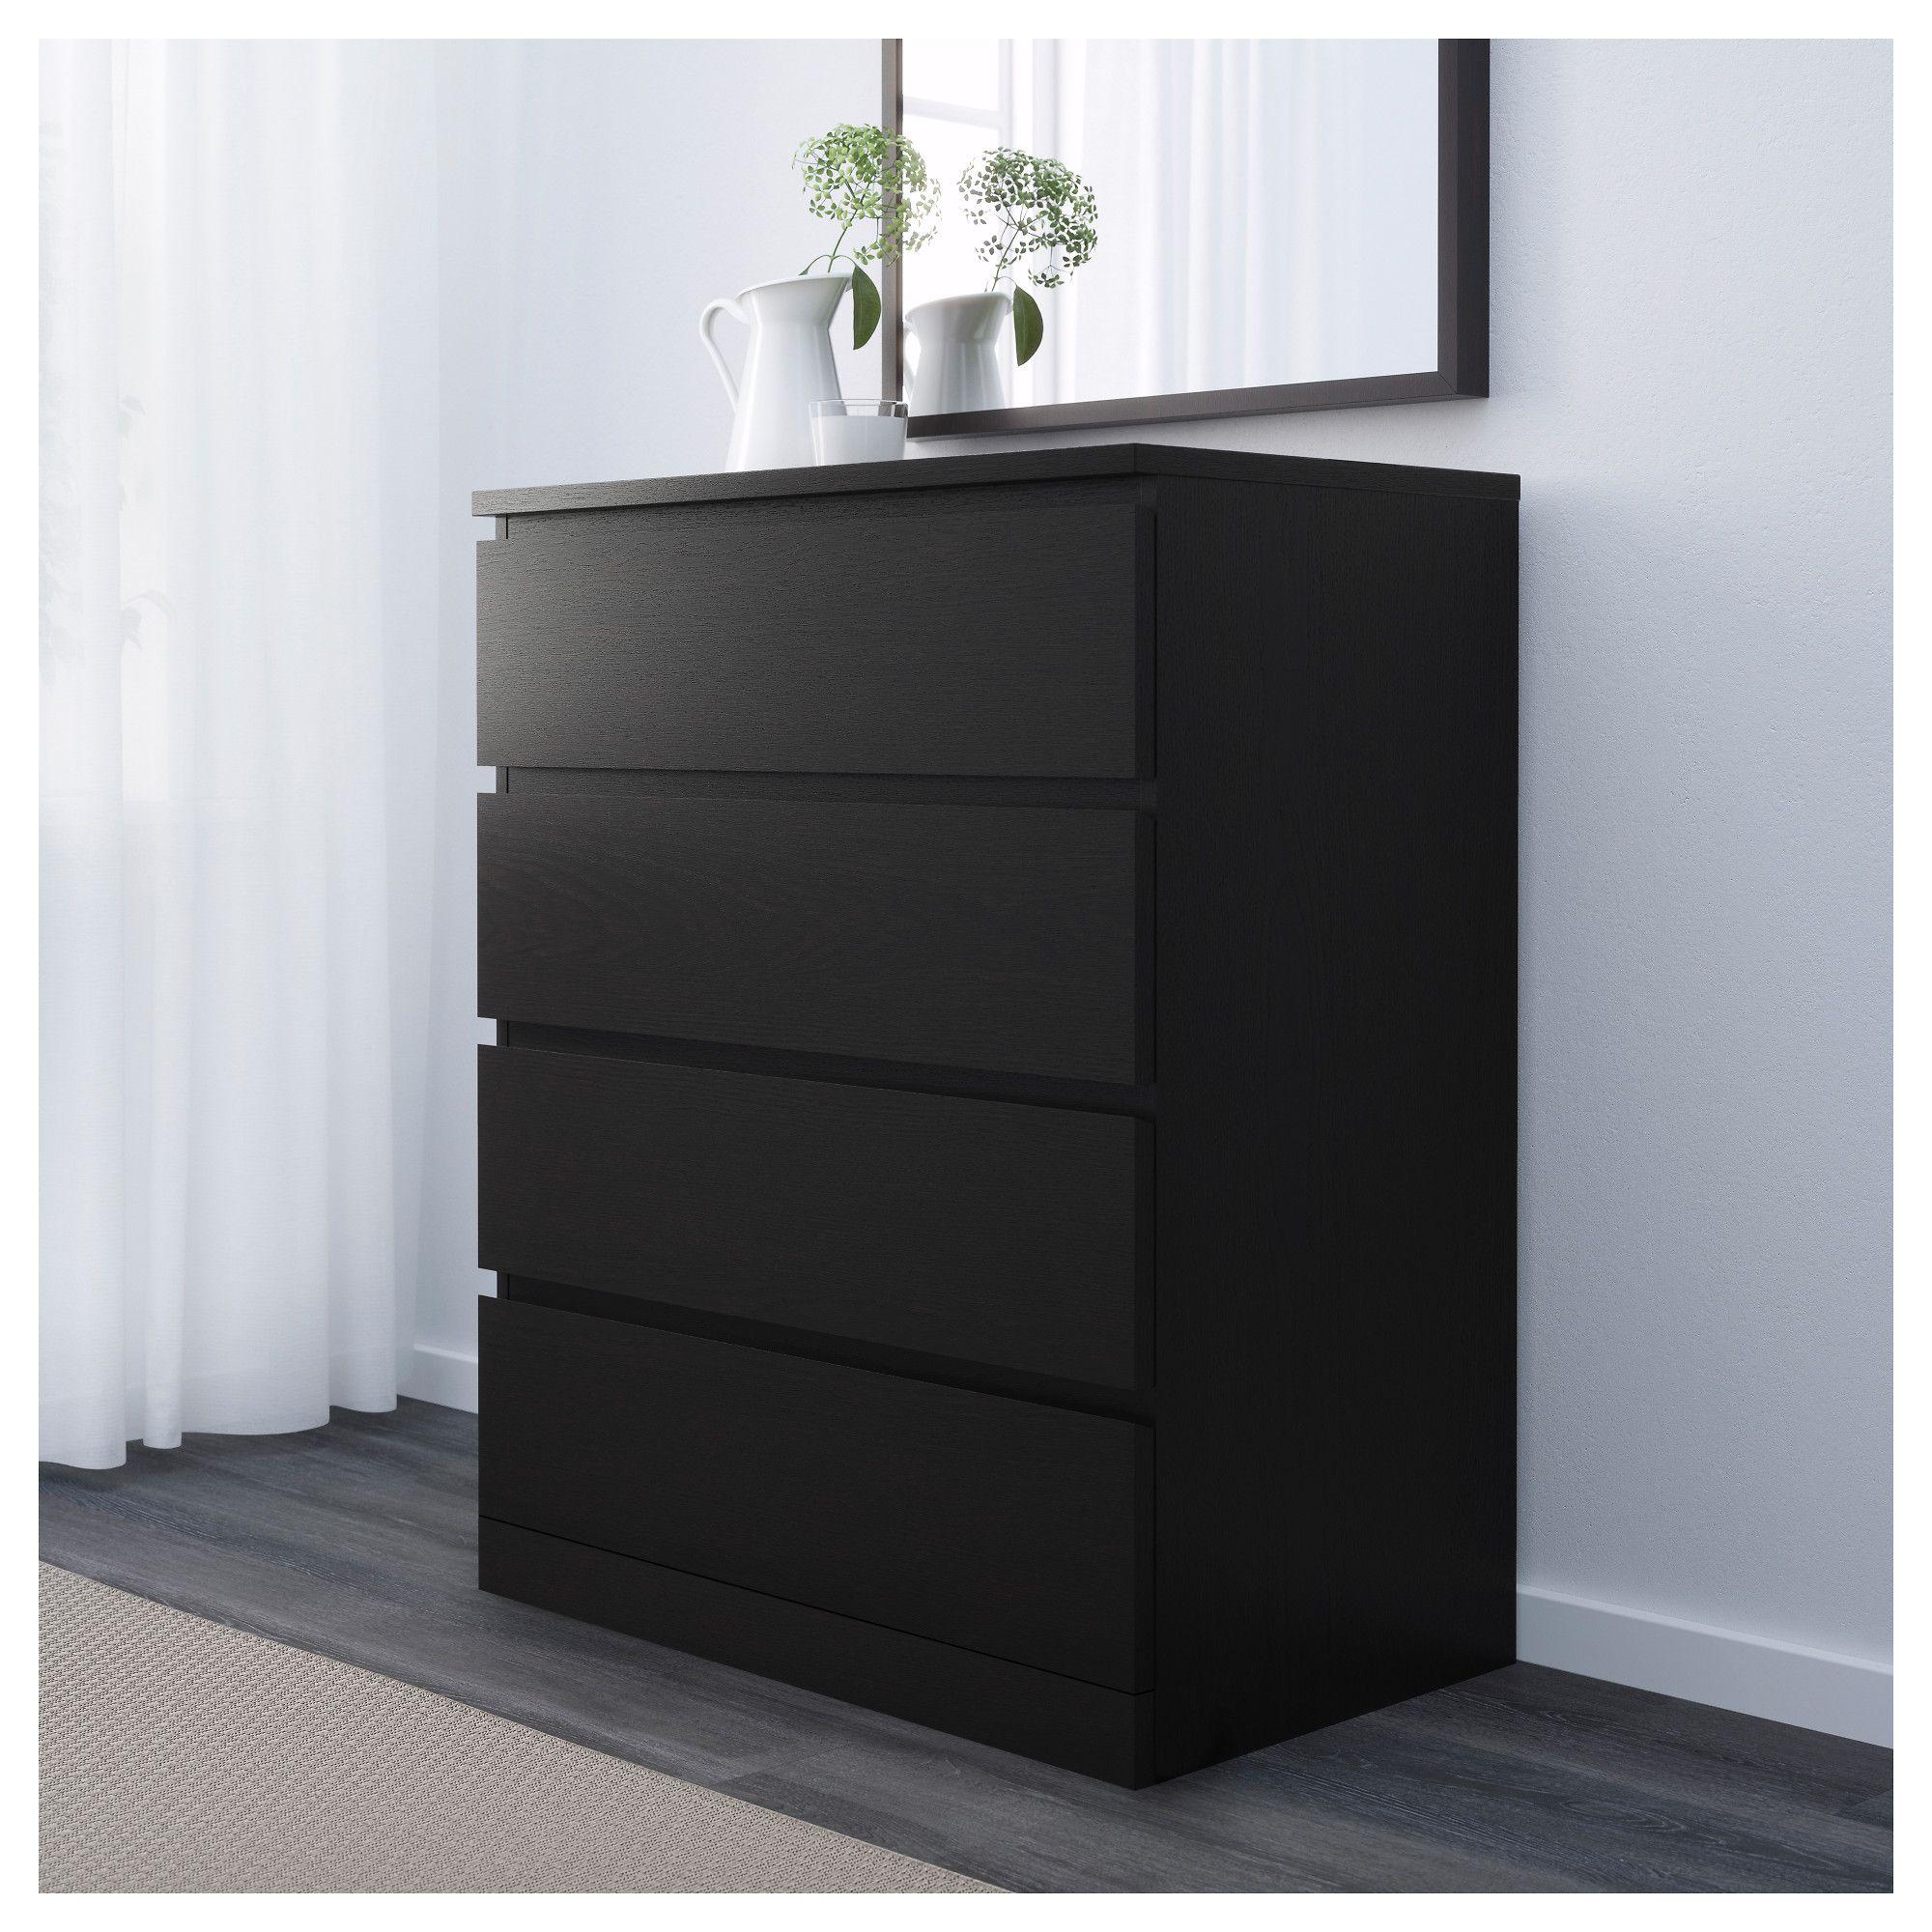 Malm 4 drawer chest black brown home pinterest for Muebles de habitacion ikea